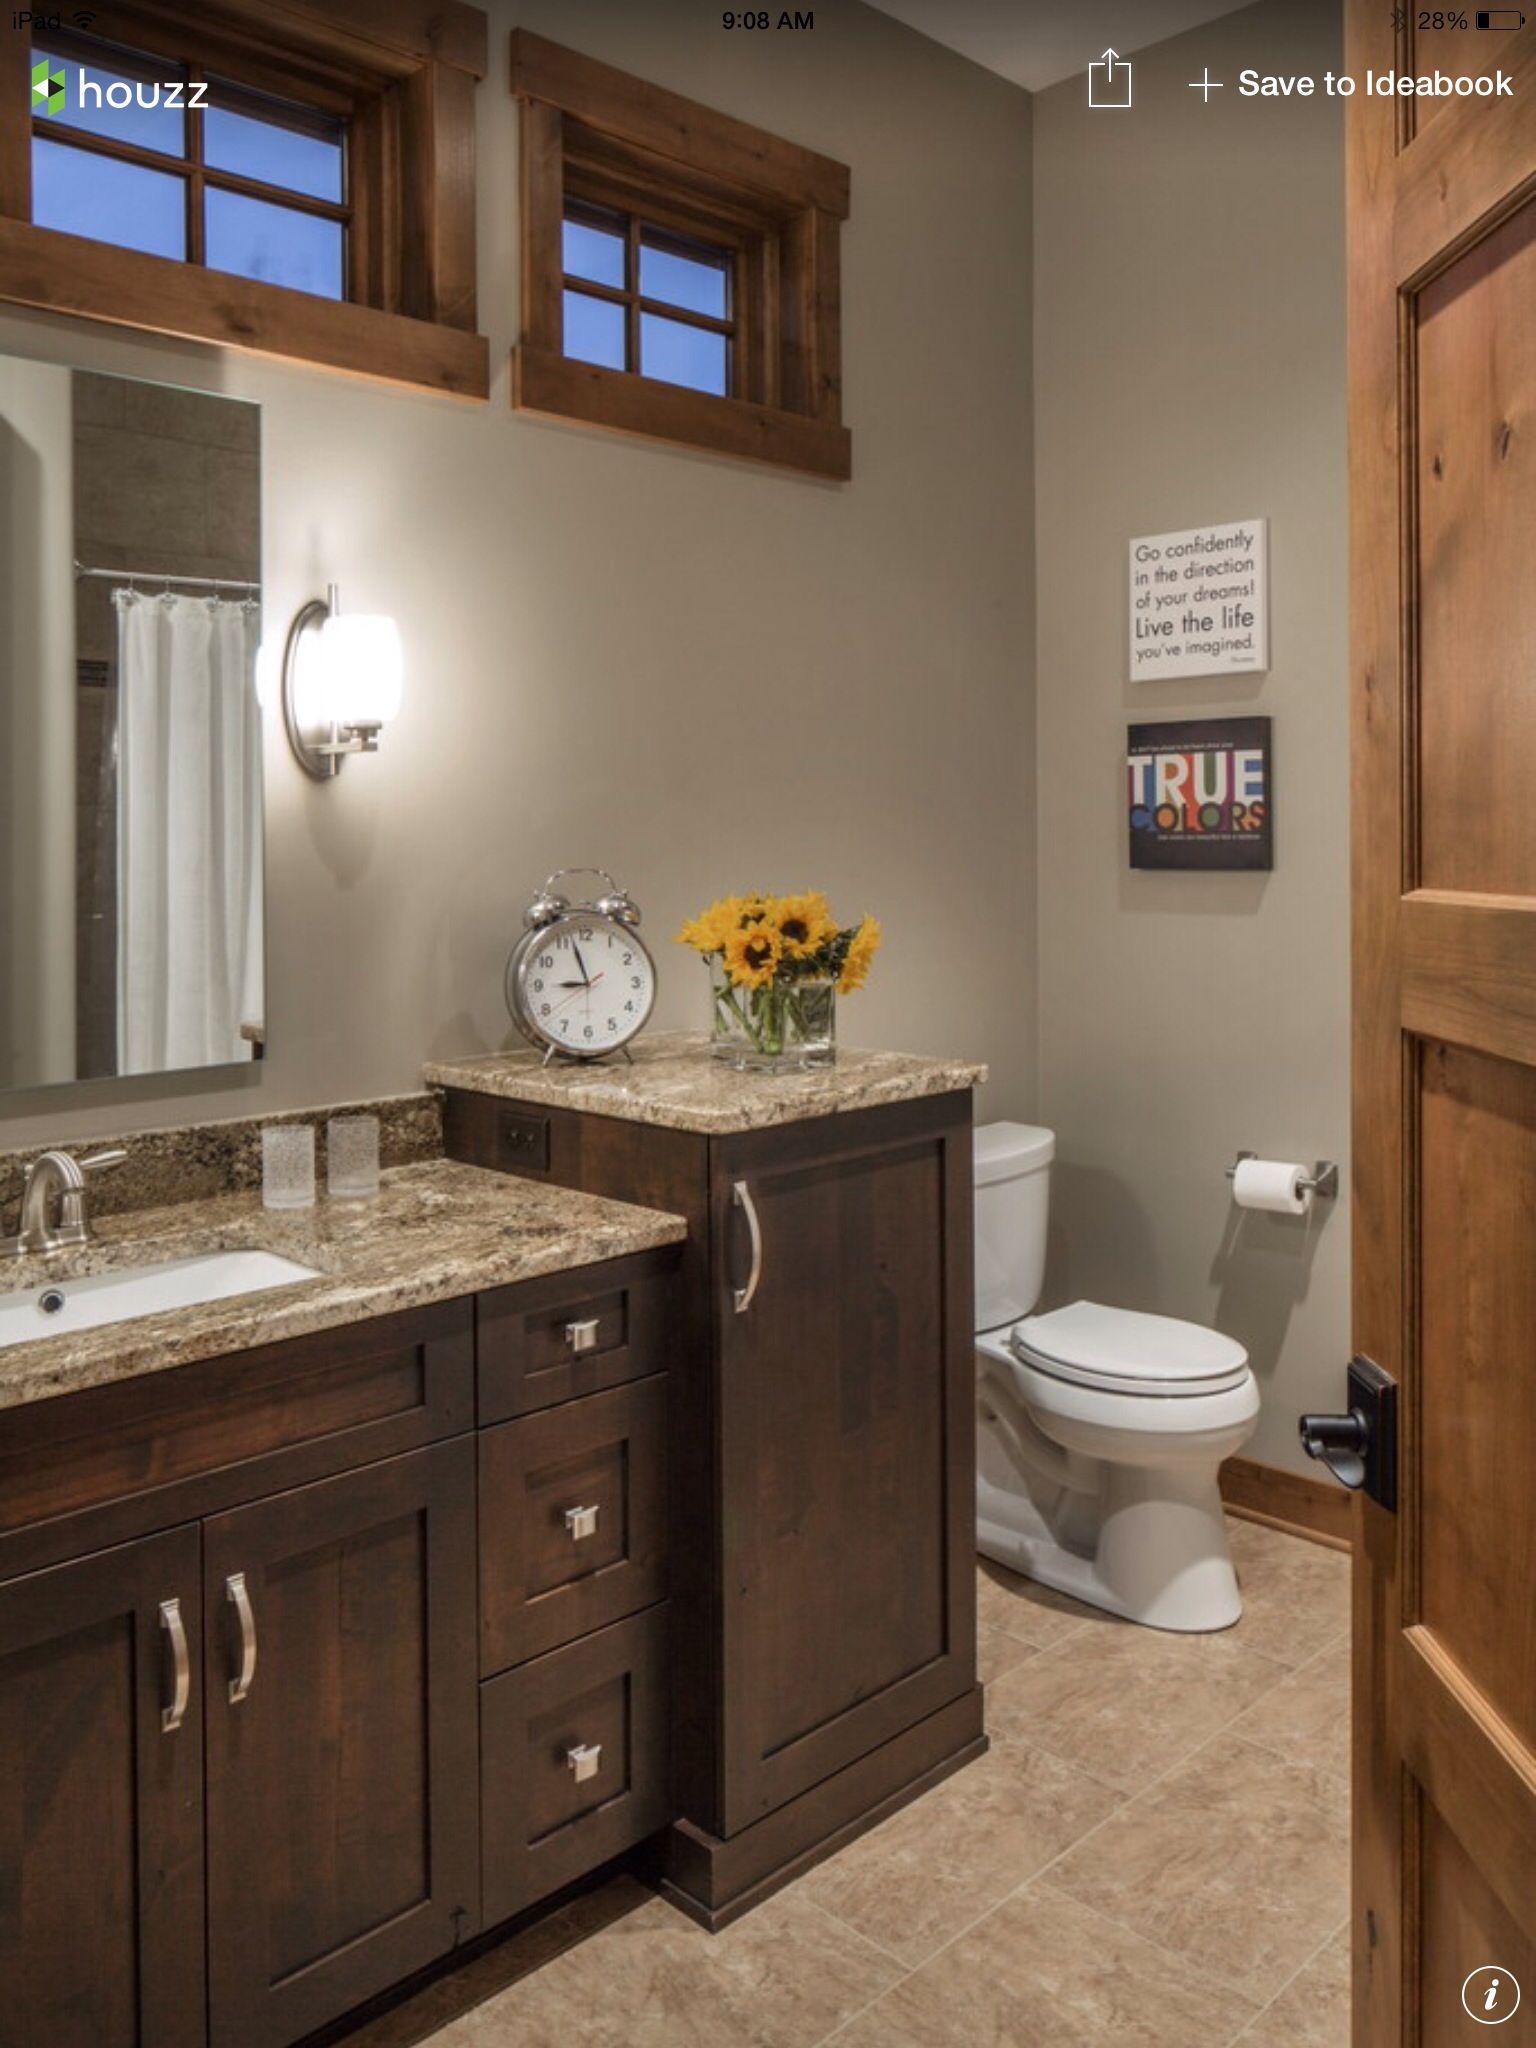 Wood Trim Around Window Lake House Bathroom House Bathroom Bathroom Decor